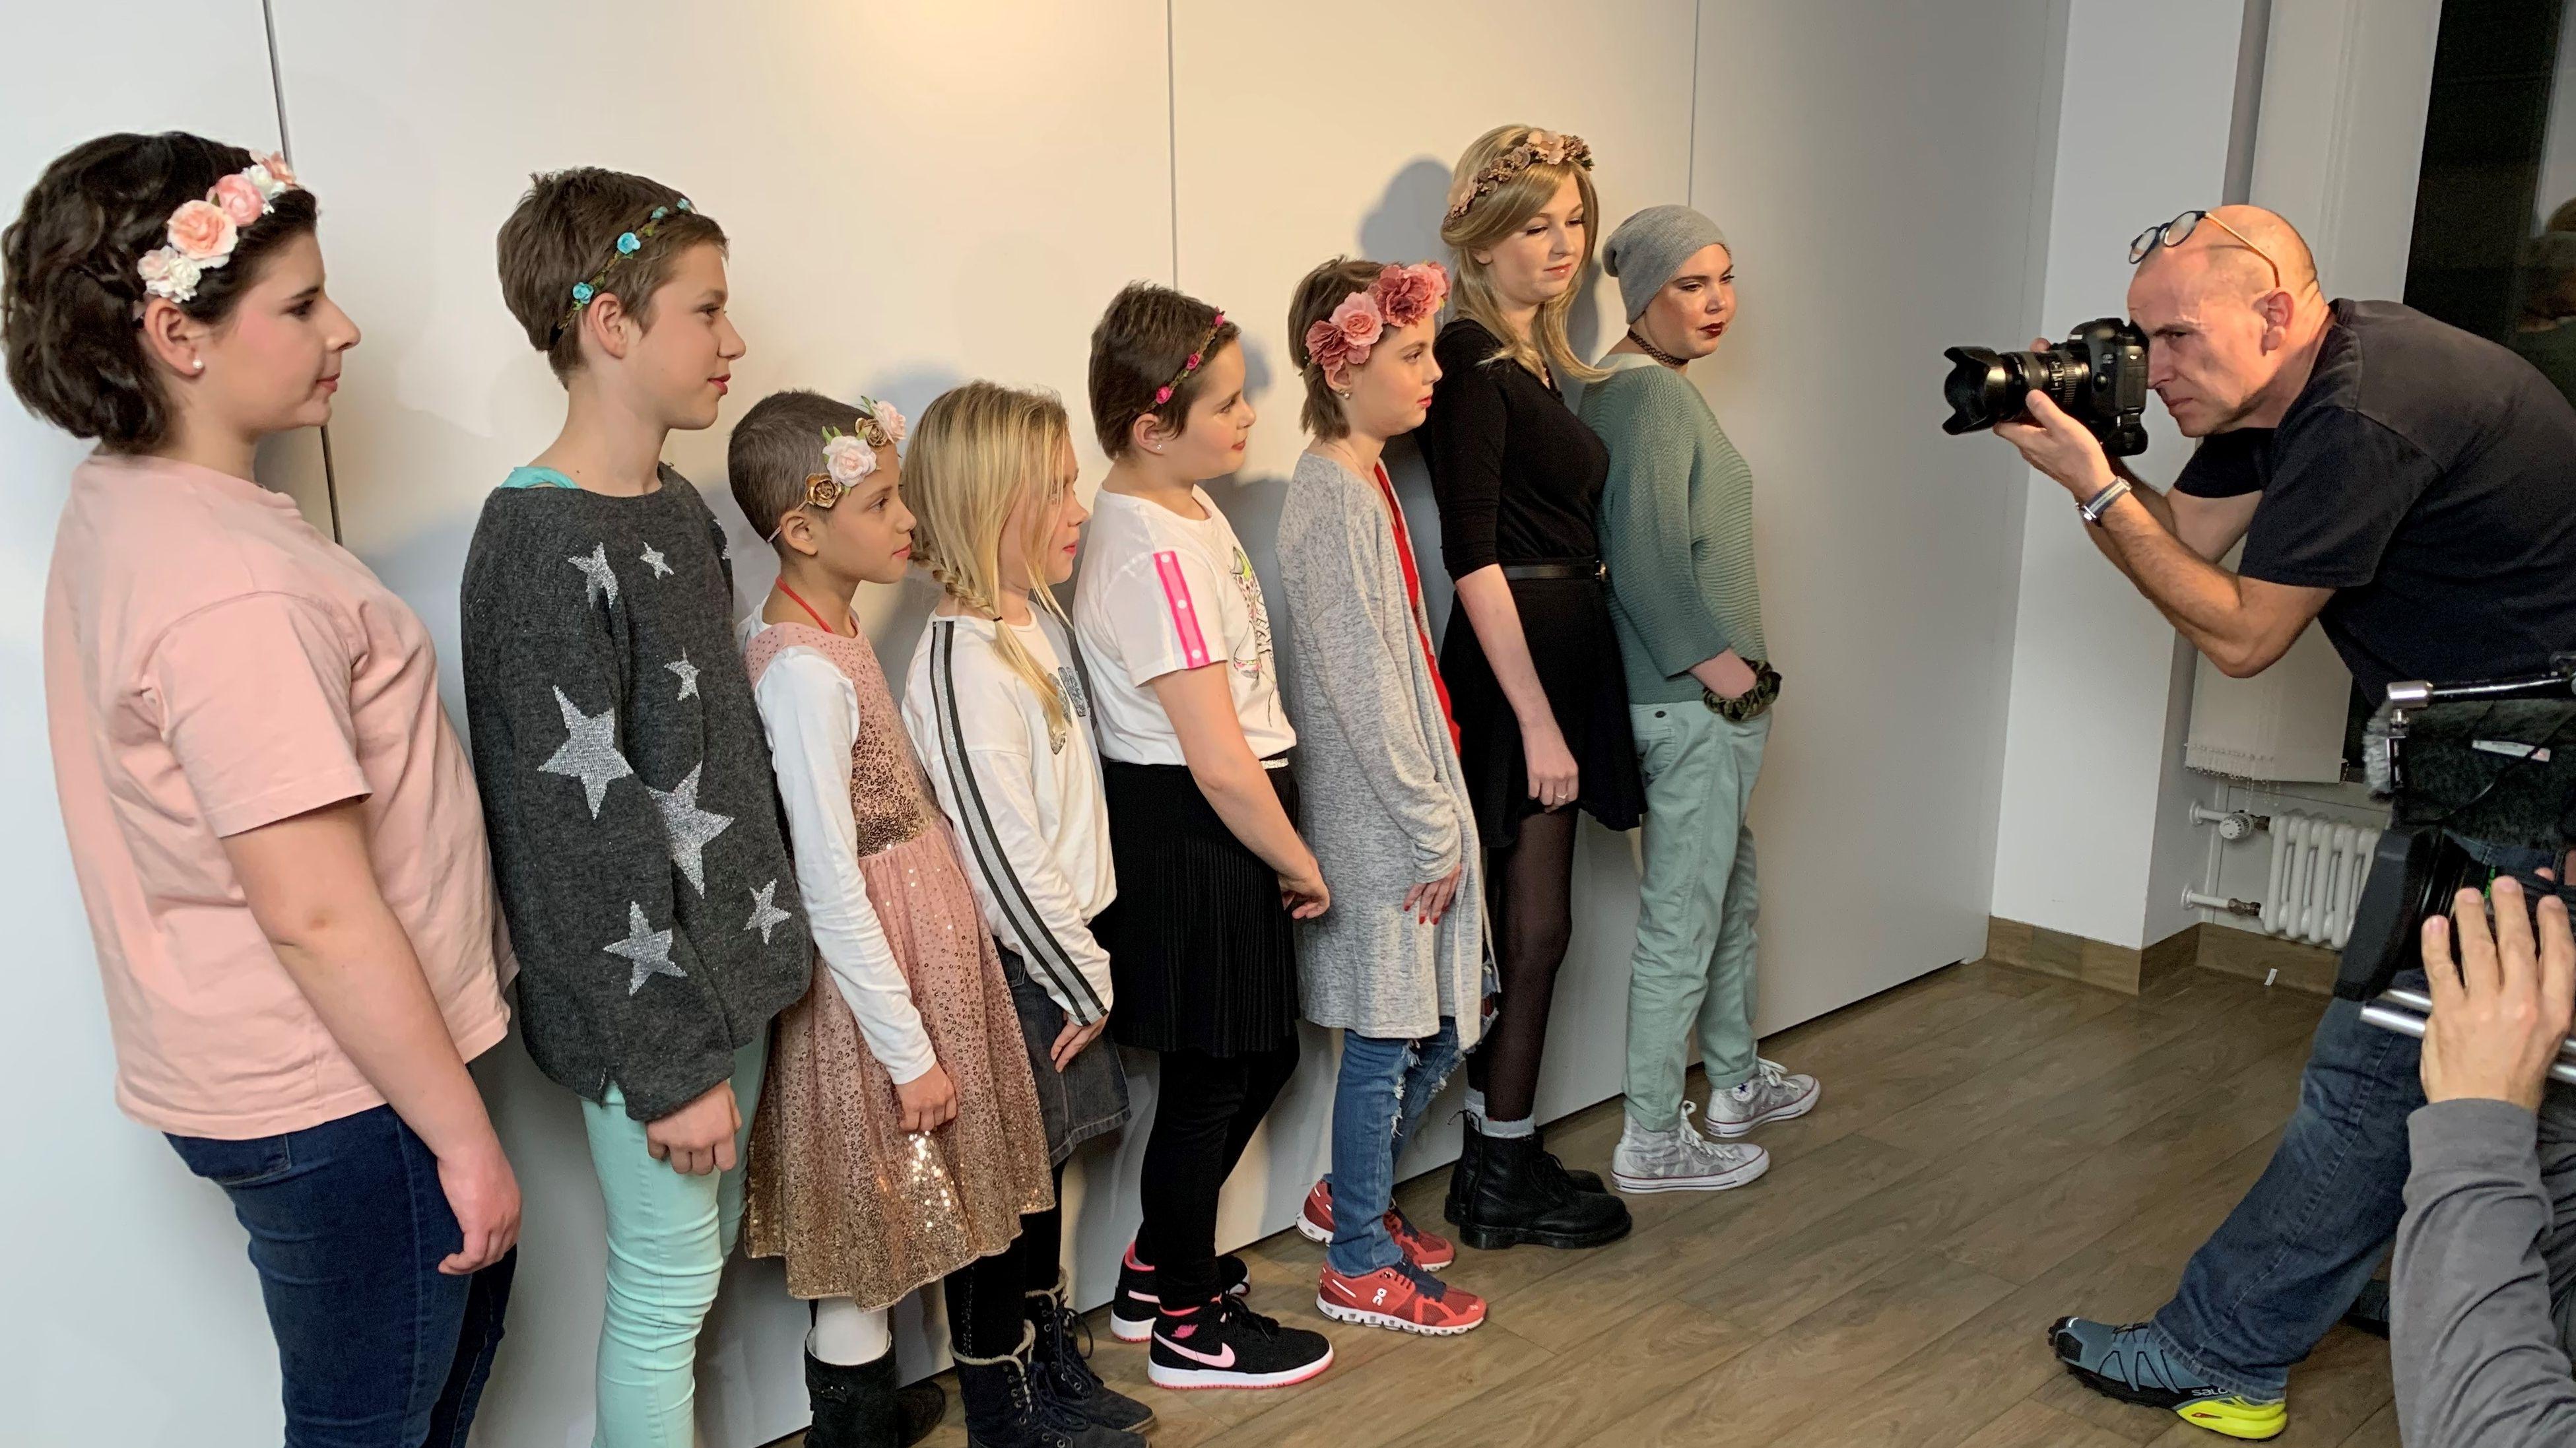 Fotoshooting mit kranken Kindern